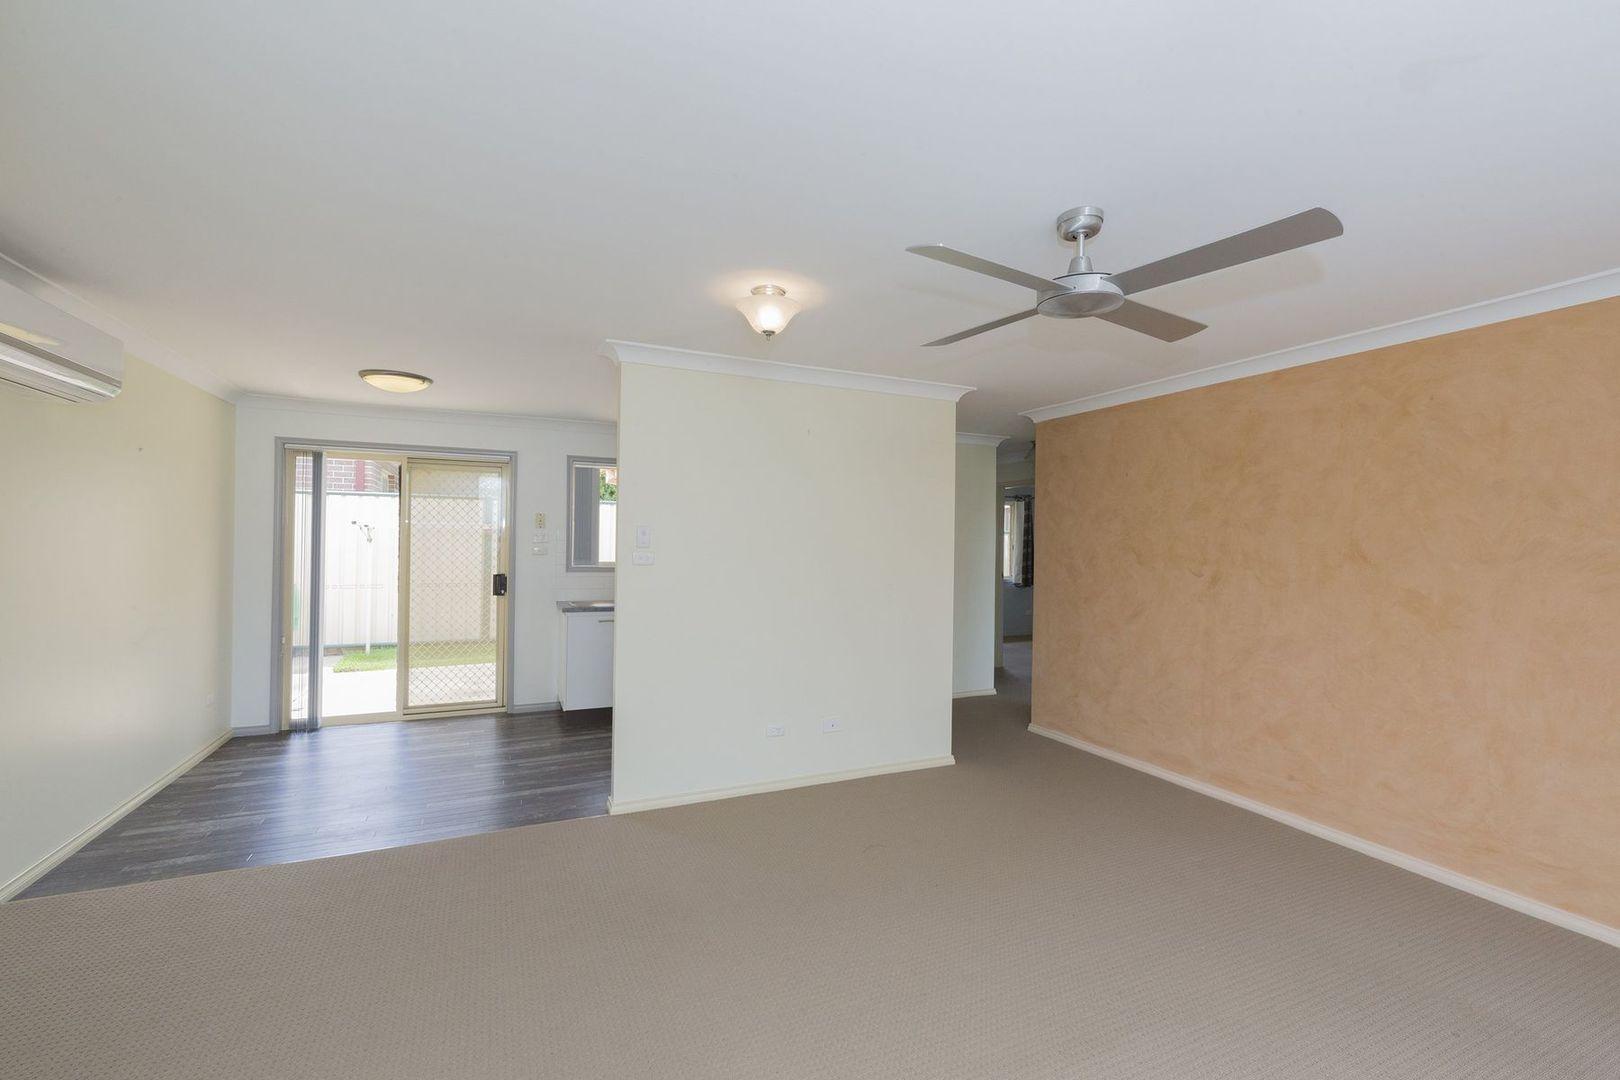 8/8-10 McLachlan Avenue, Long Jetty NSW 2261, Image 1